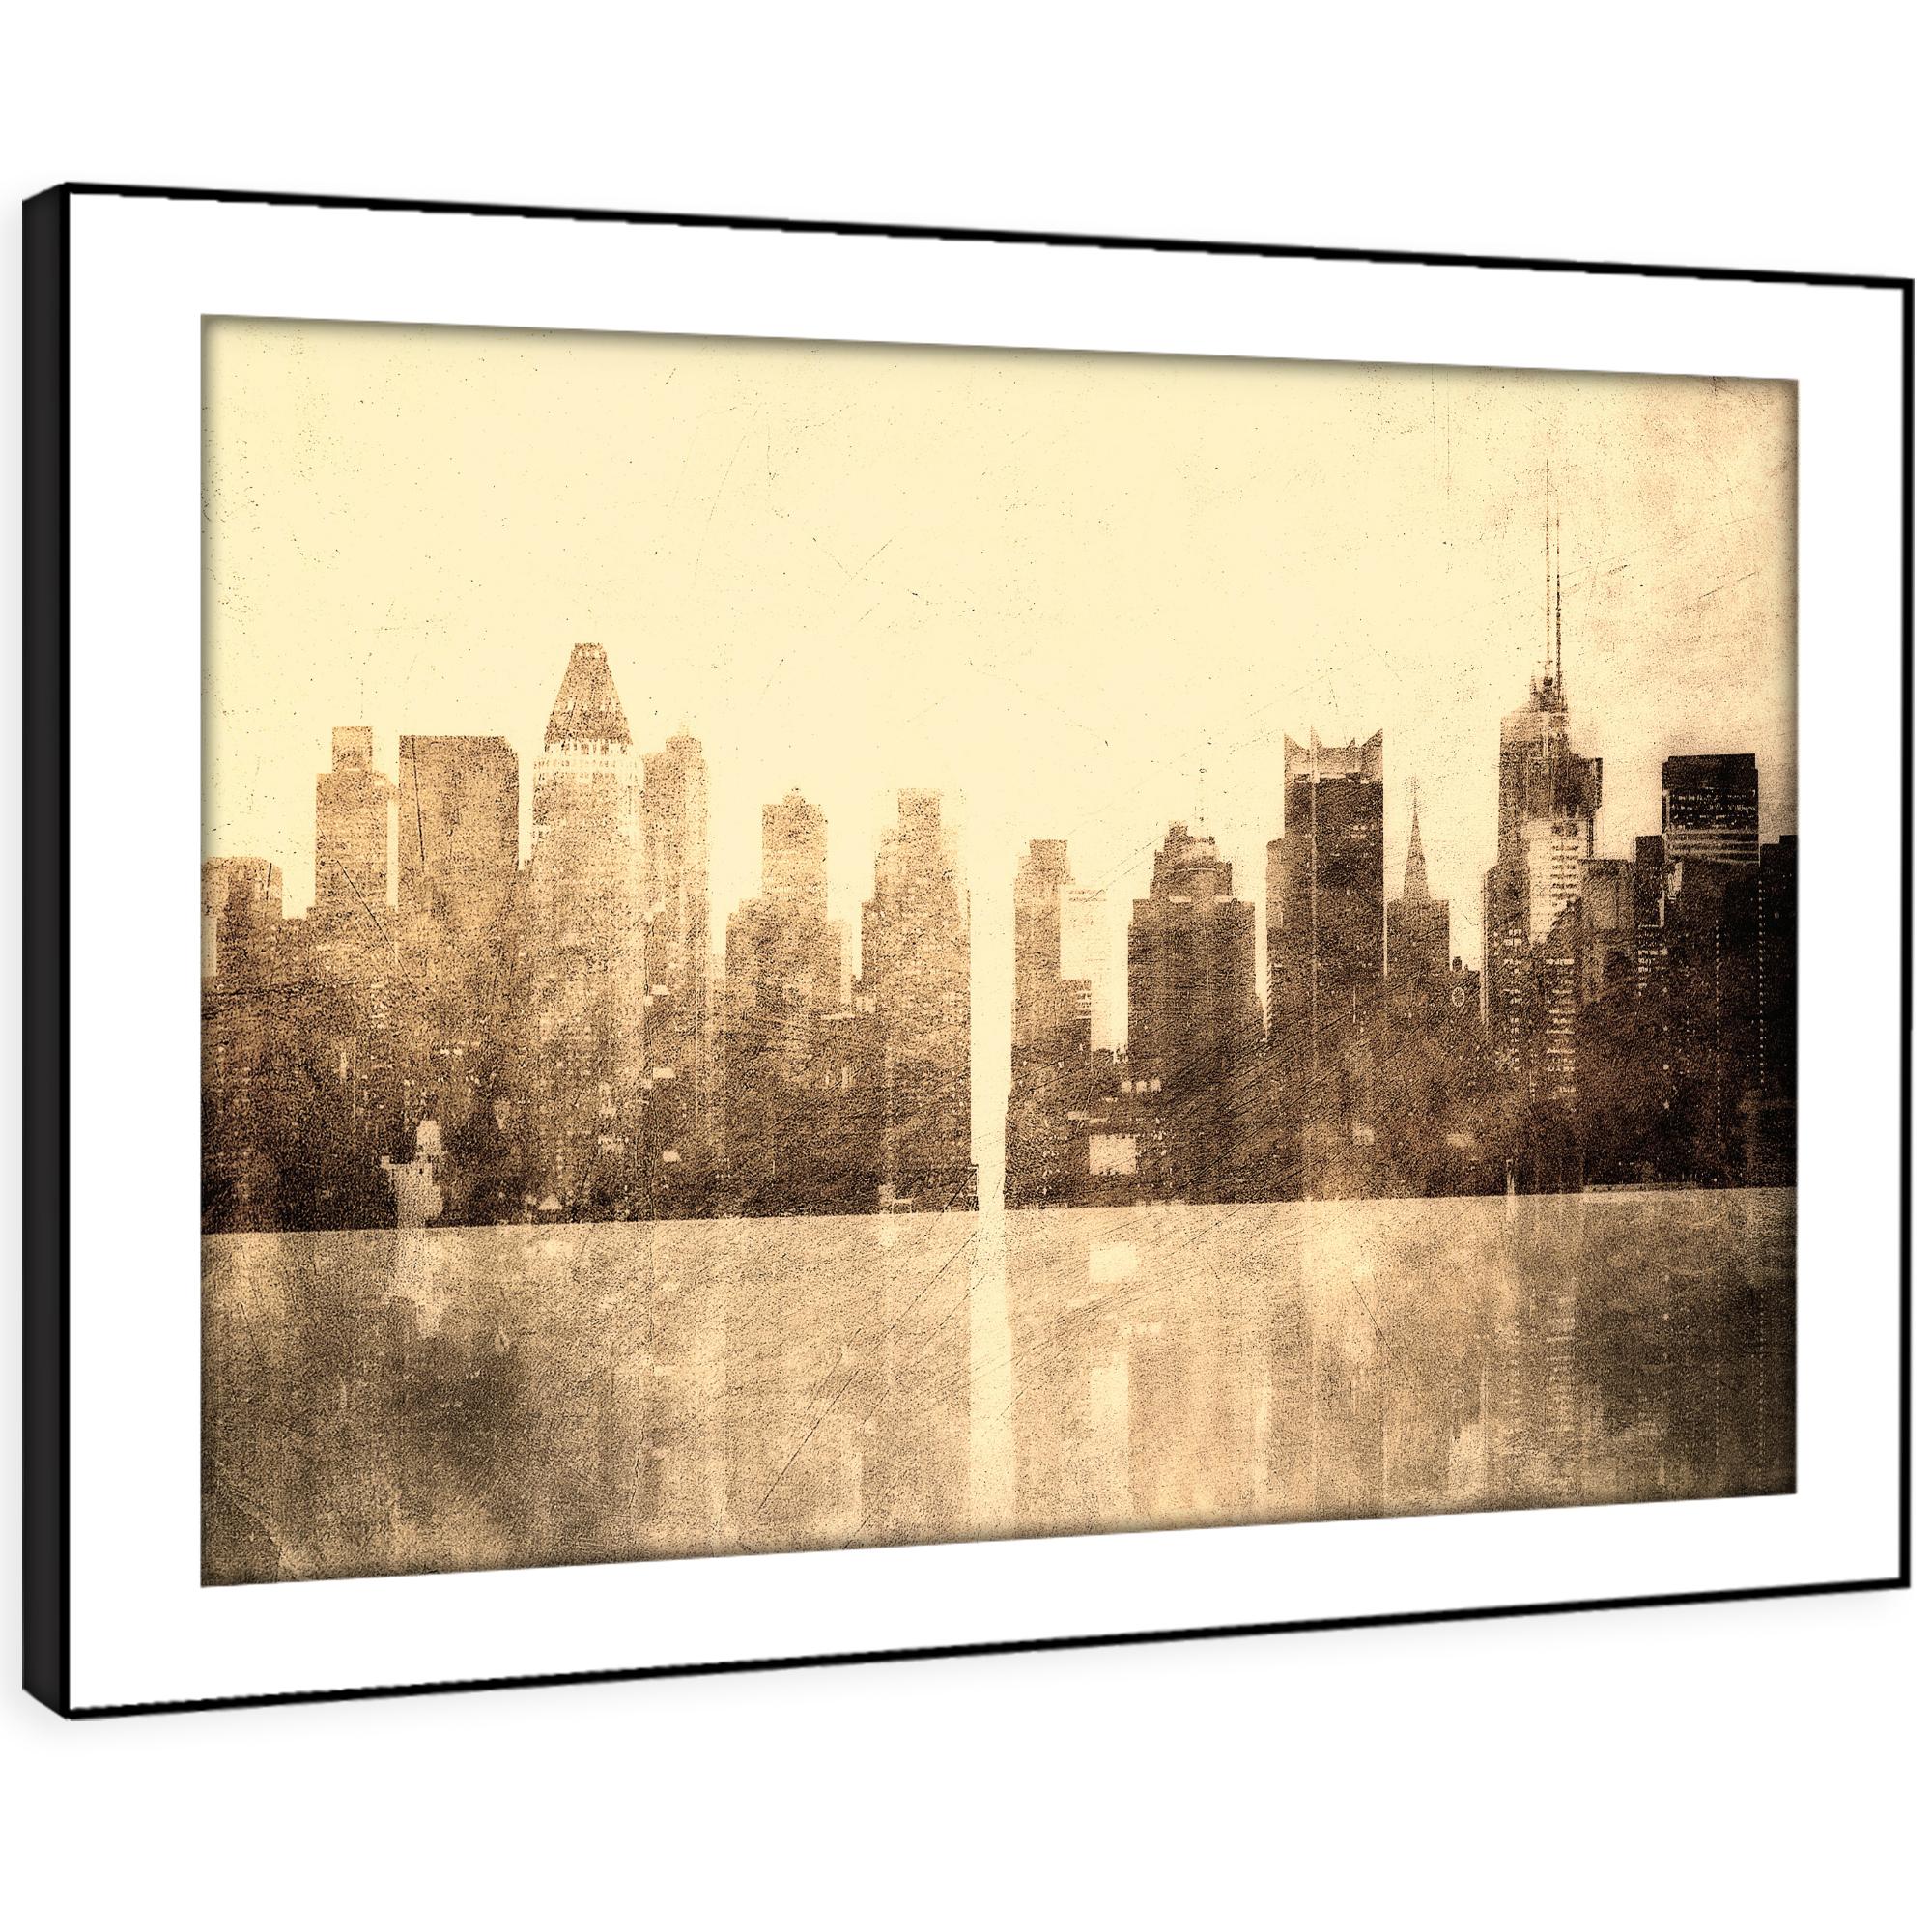 SC324 Retro Vintage New York Cool Landscape Framed Wall Art Large Picture Prints